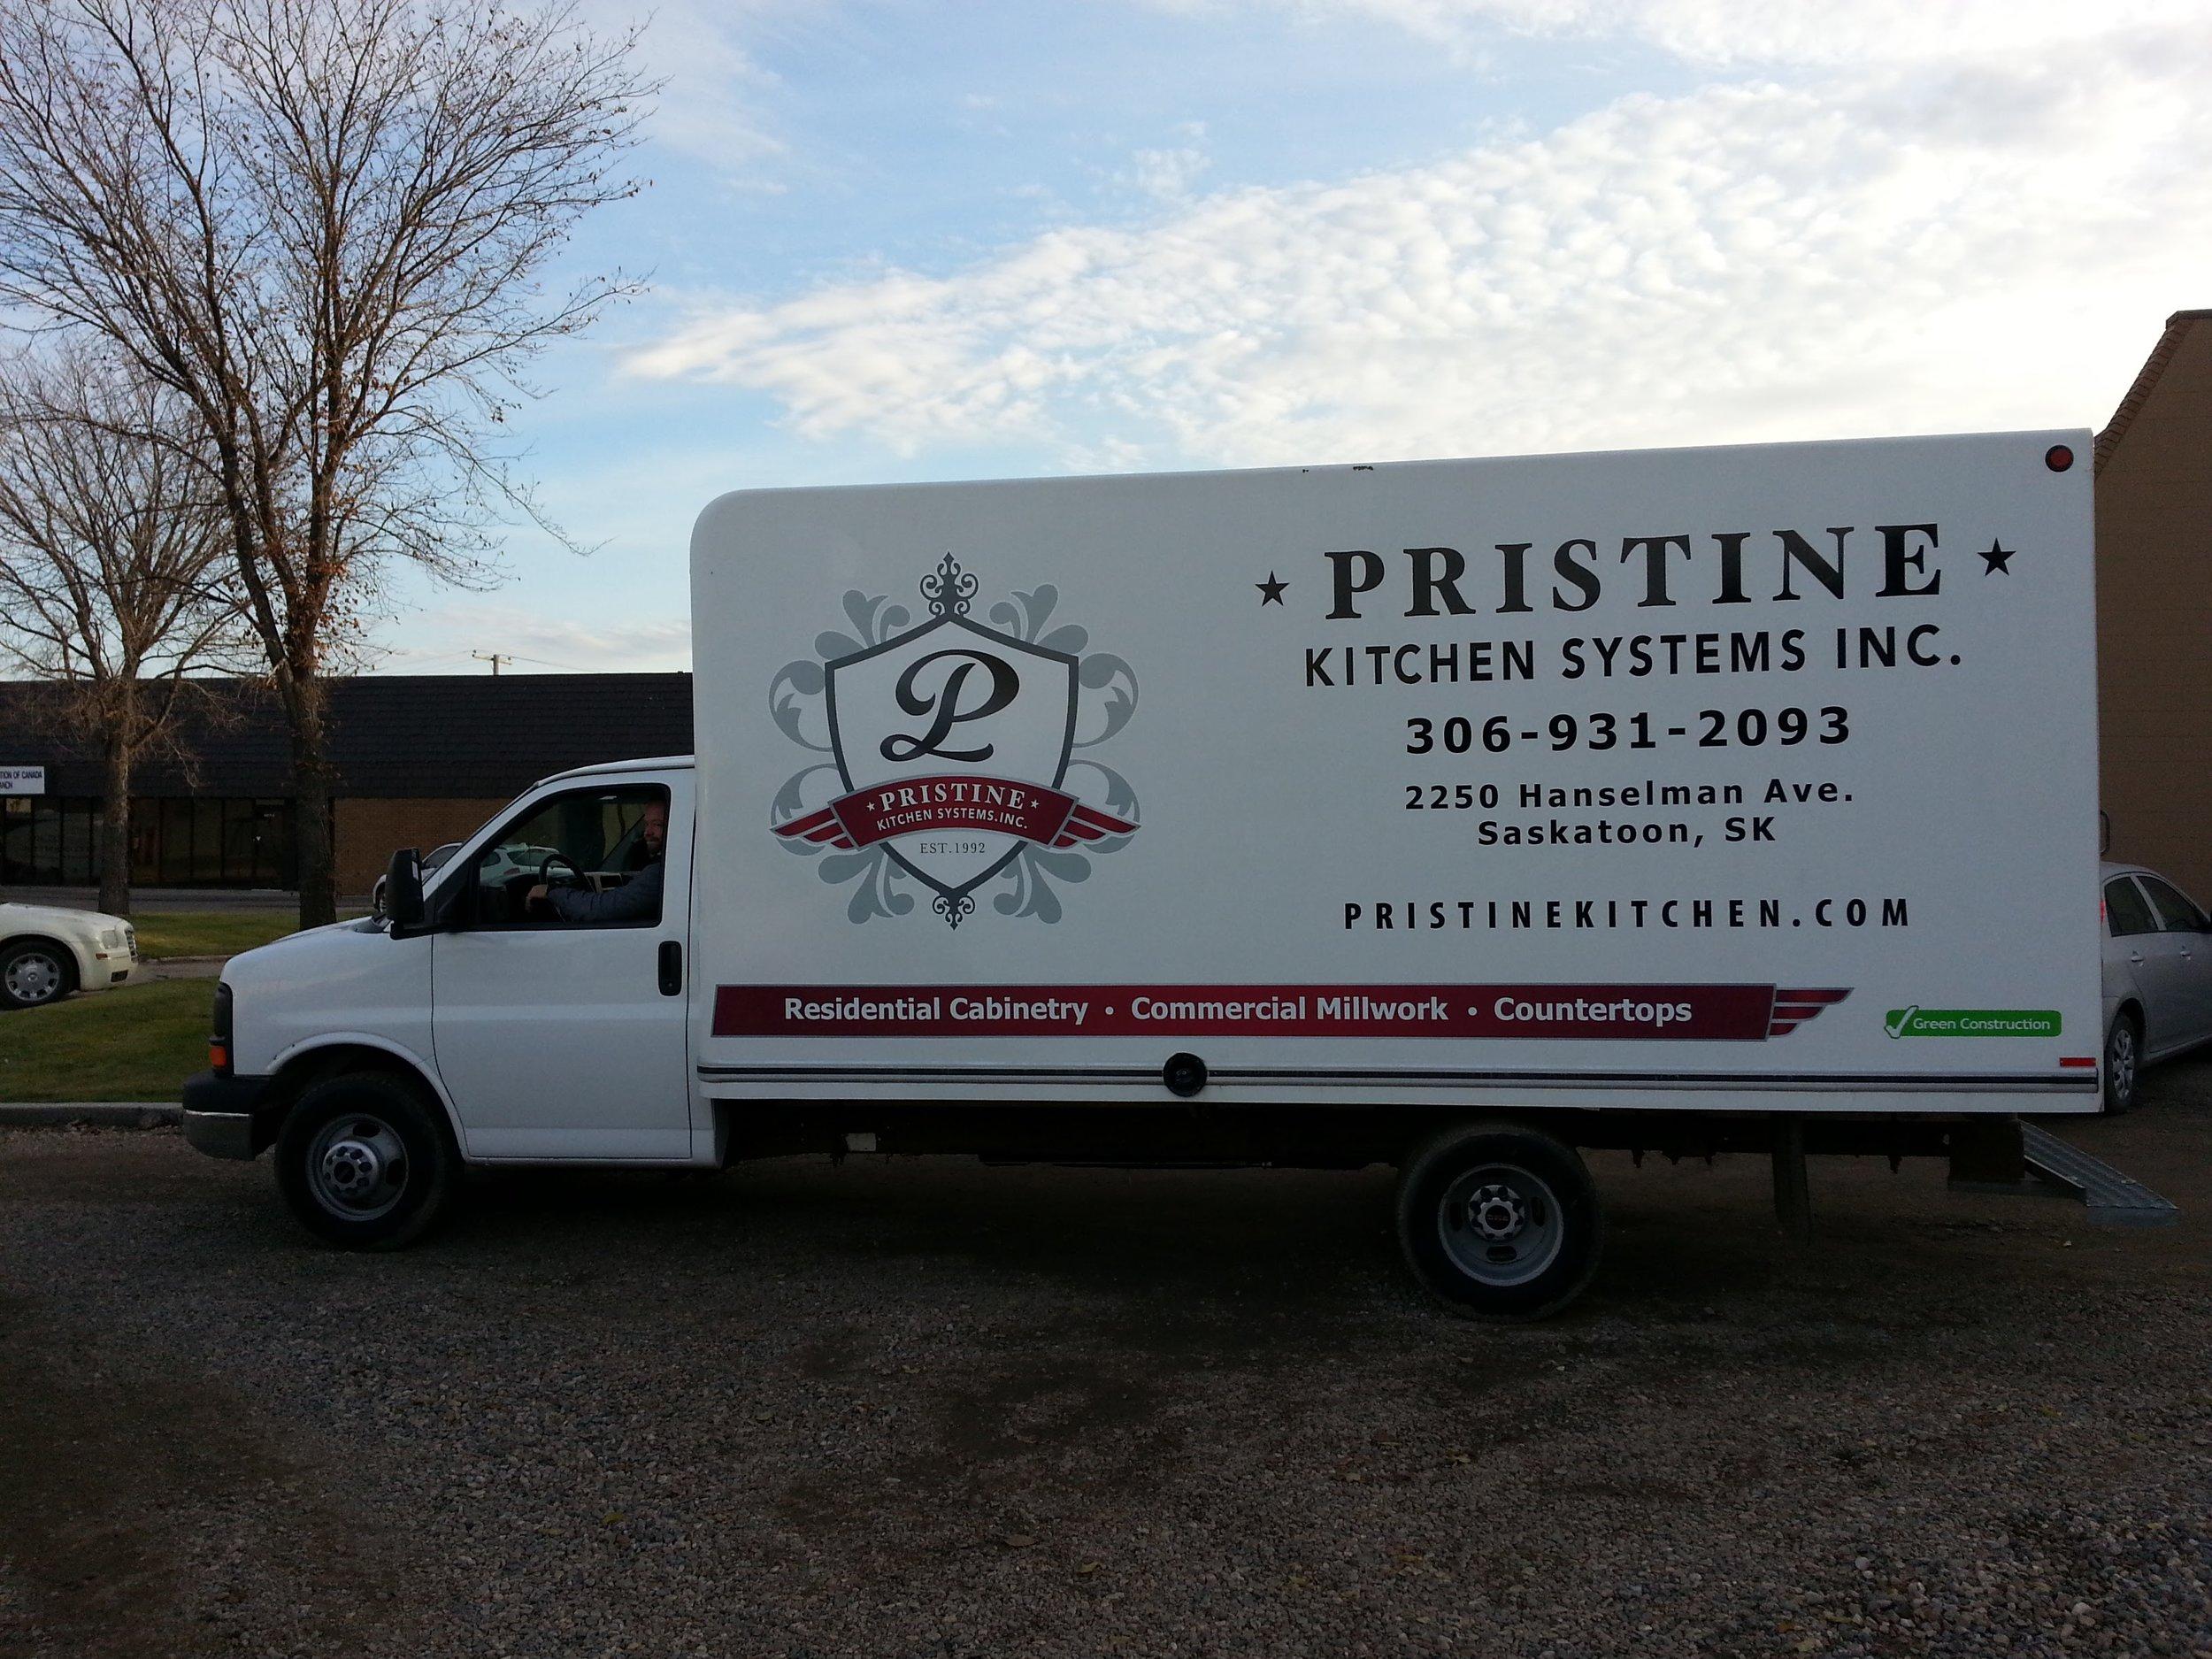 Pristine Kitchen Systems, Saskatoon